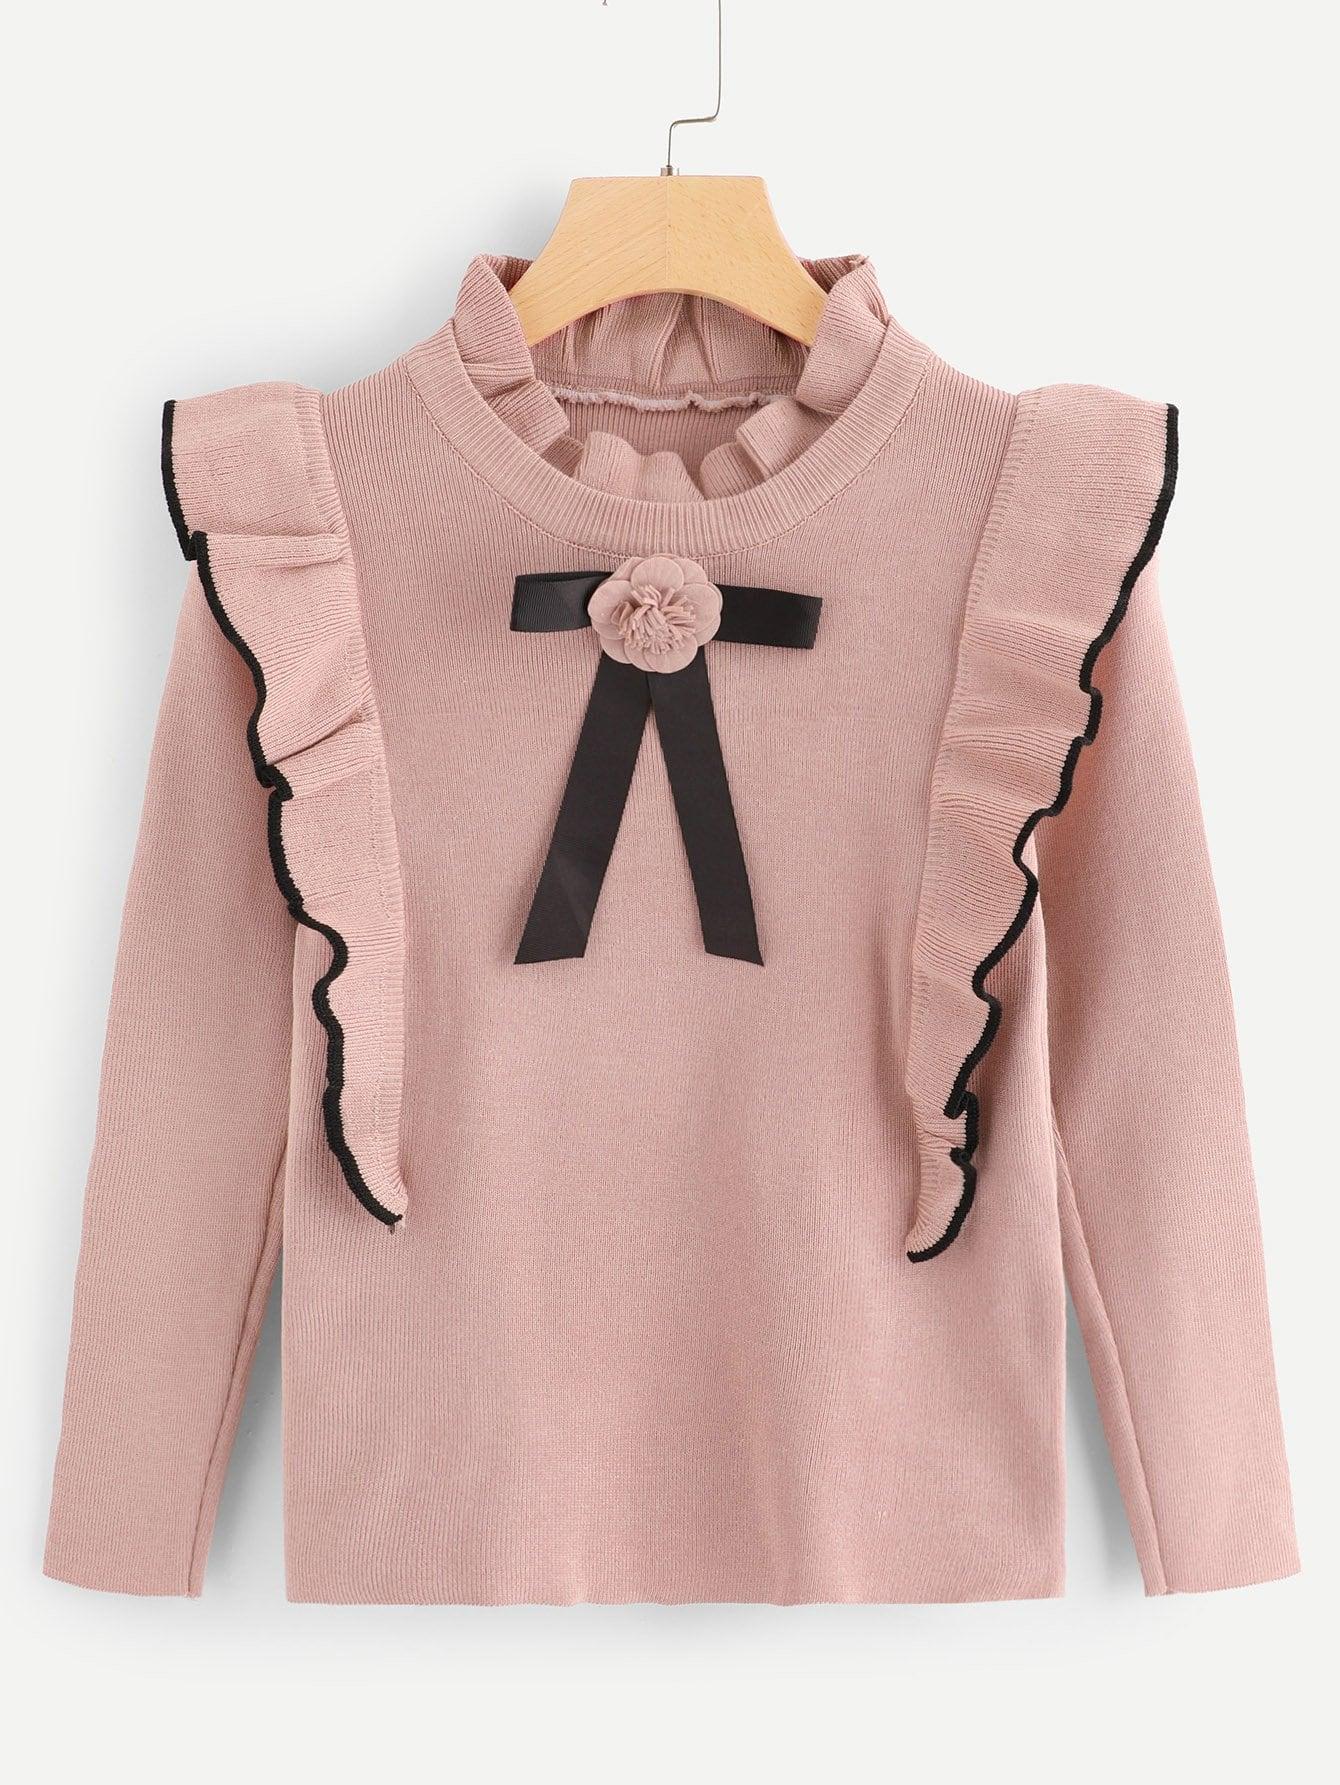 Ruffle Trim Floral Detail Sweater